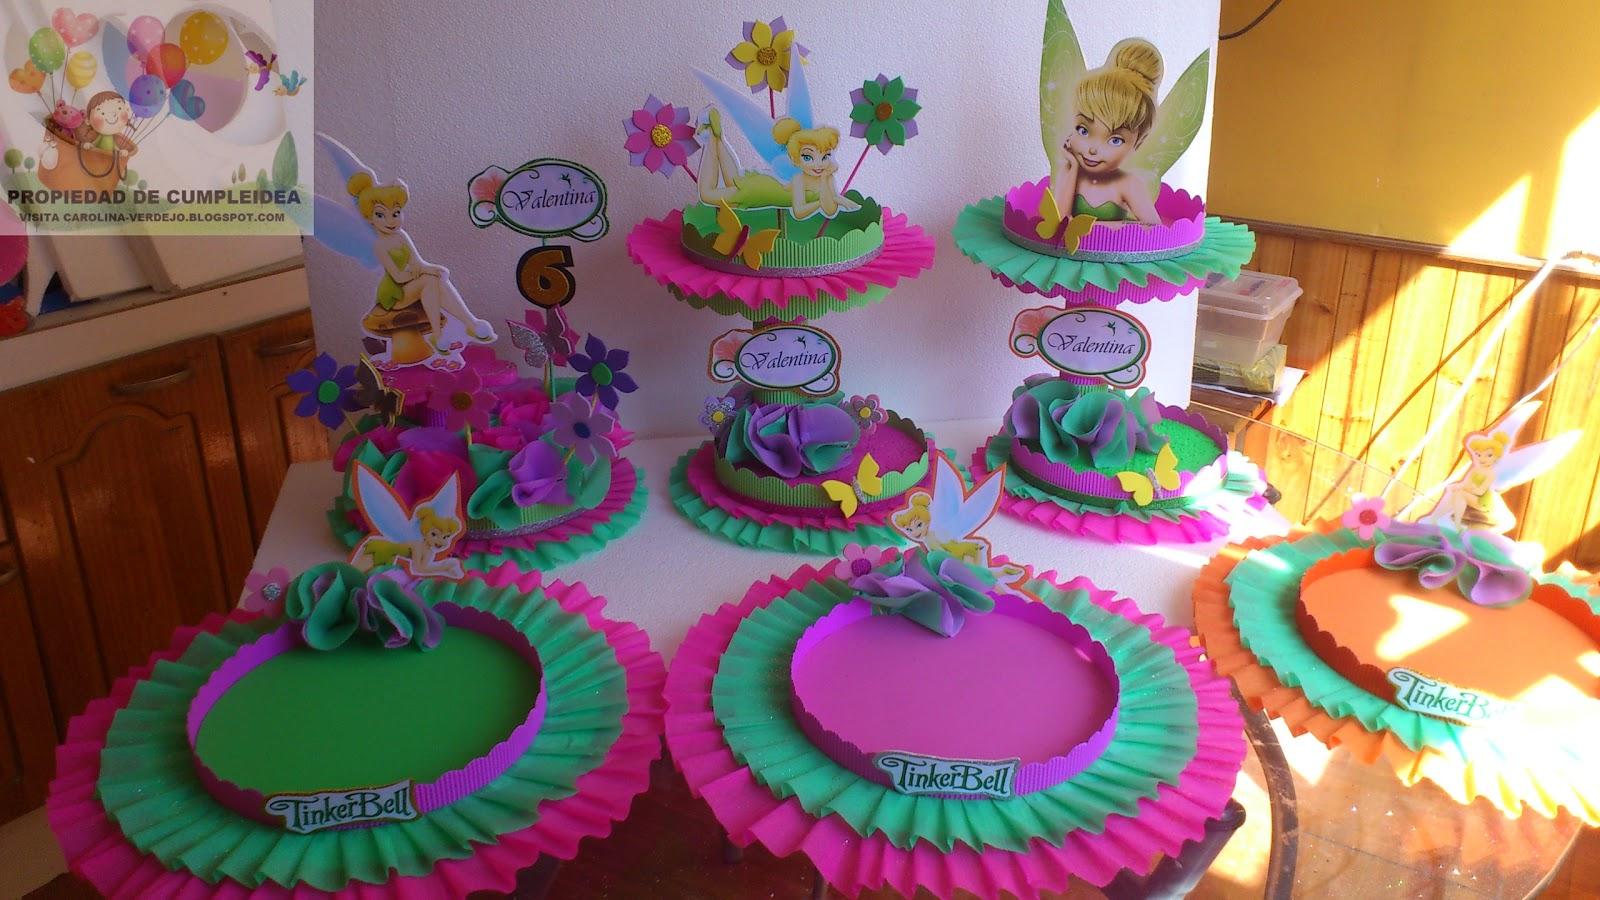 Decoraciones infantiles tinkerbell for Manualidades decoracion infantil